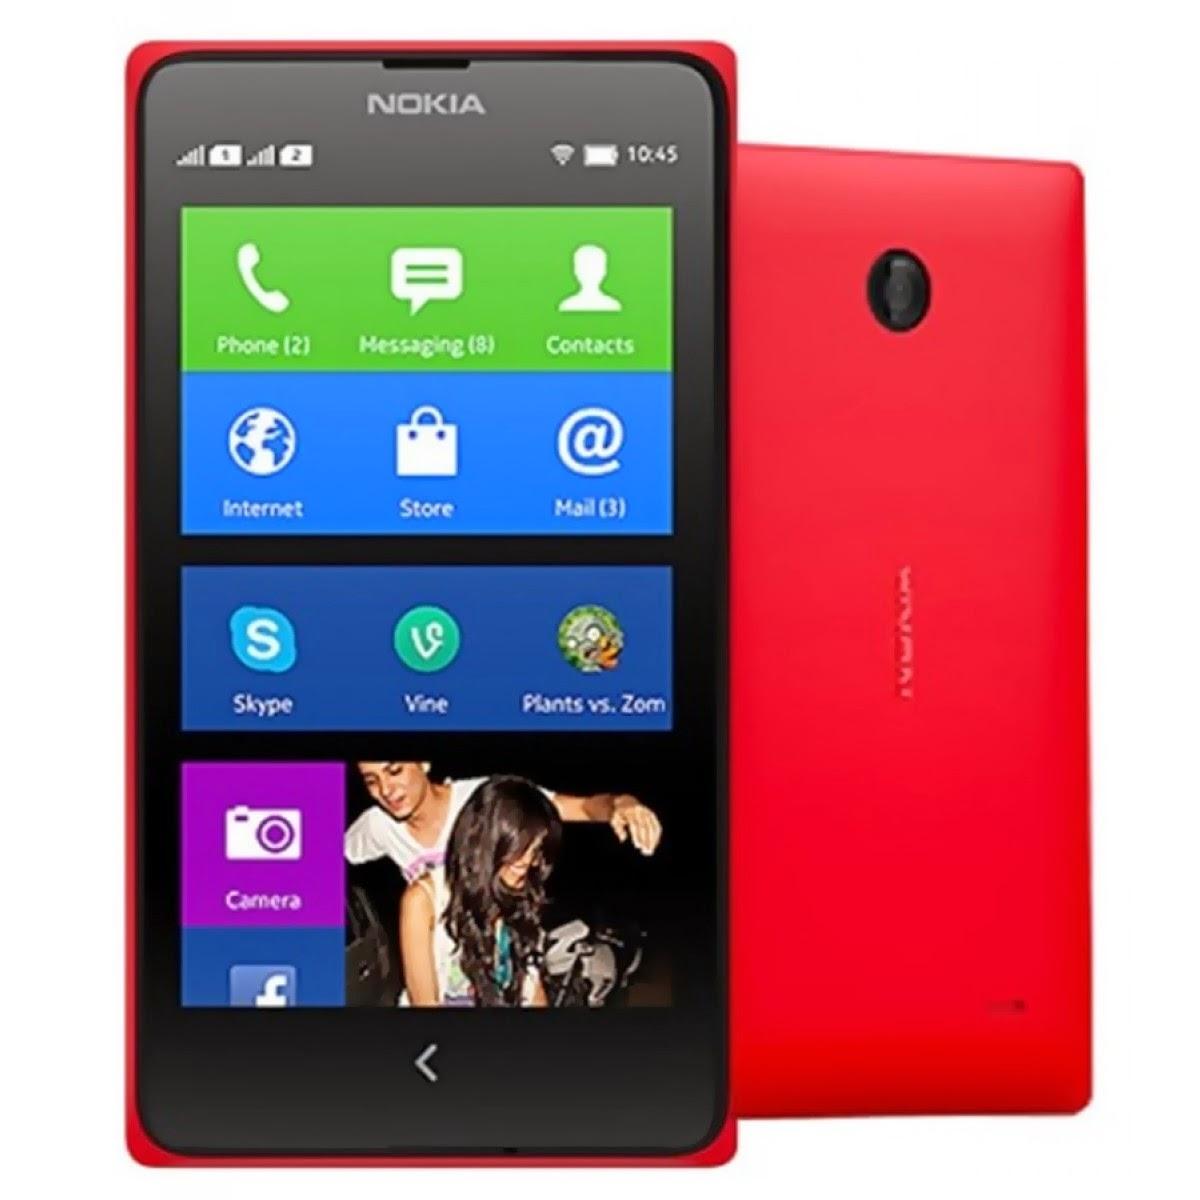 Harga Nokia X Rp 16 Jutaaan Android Pertama